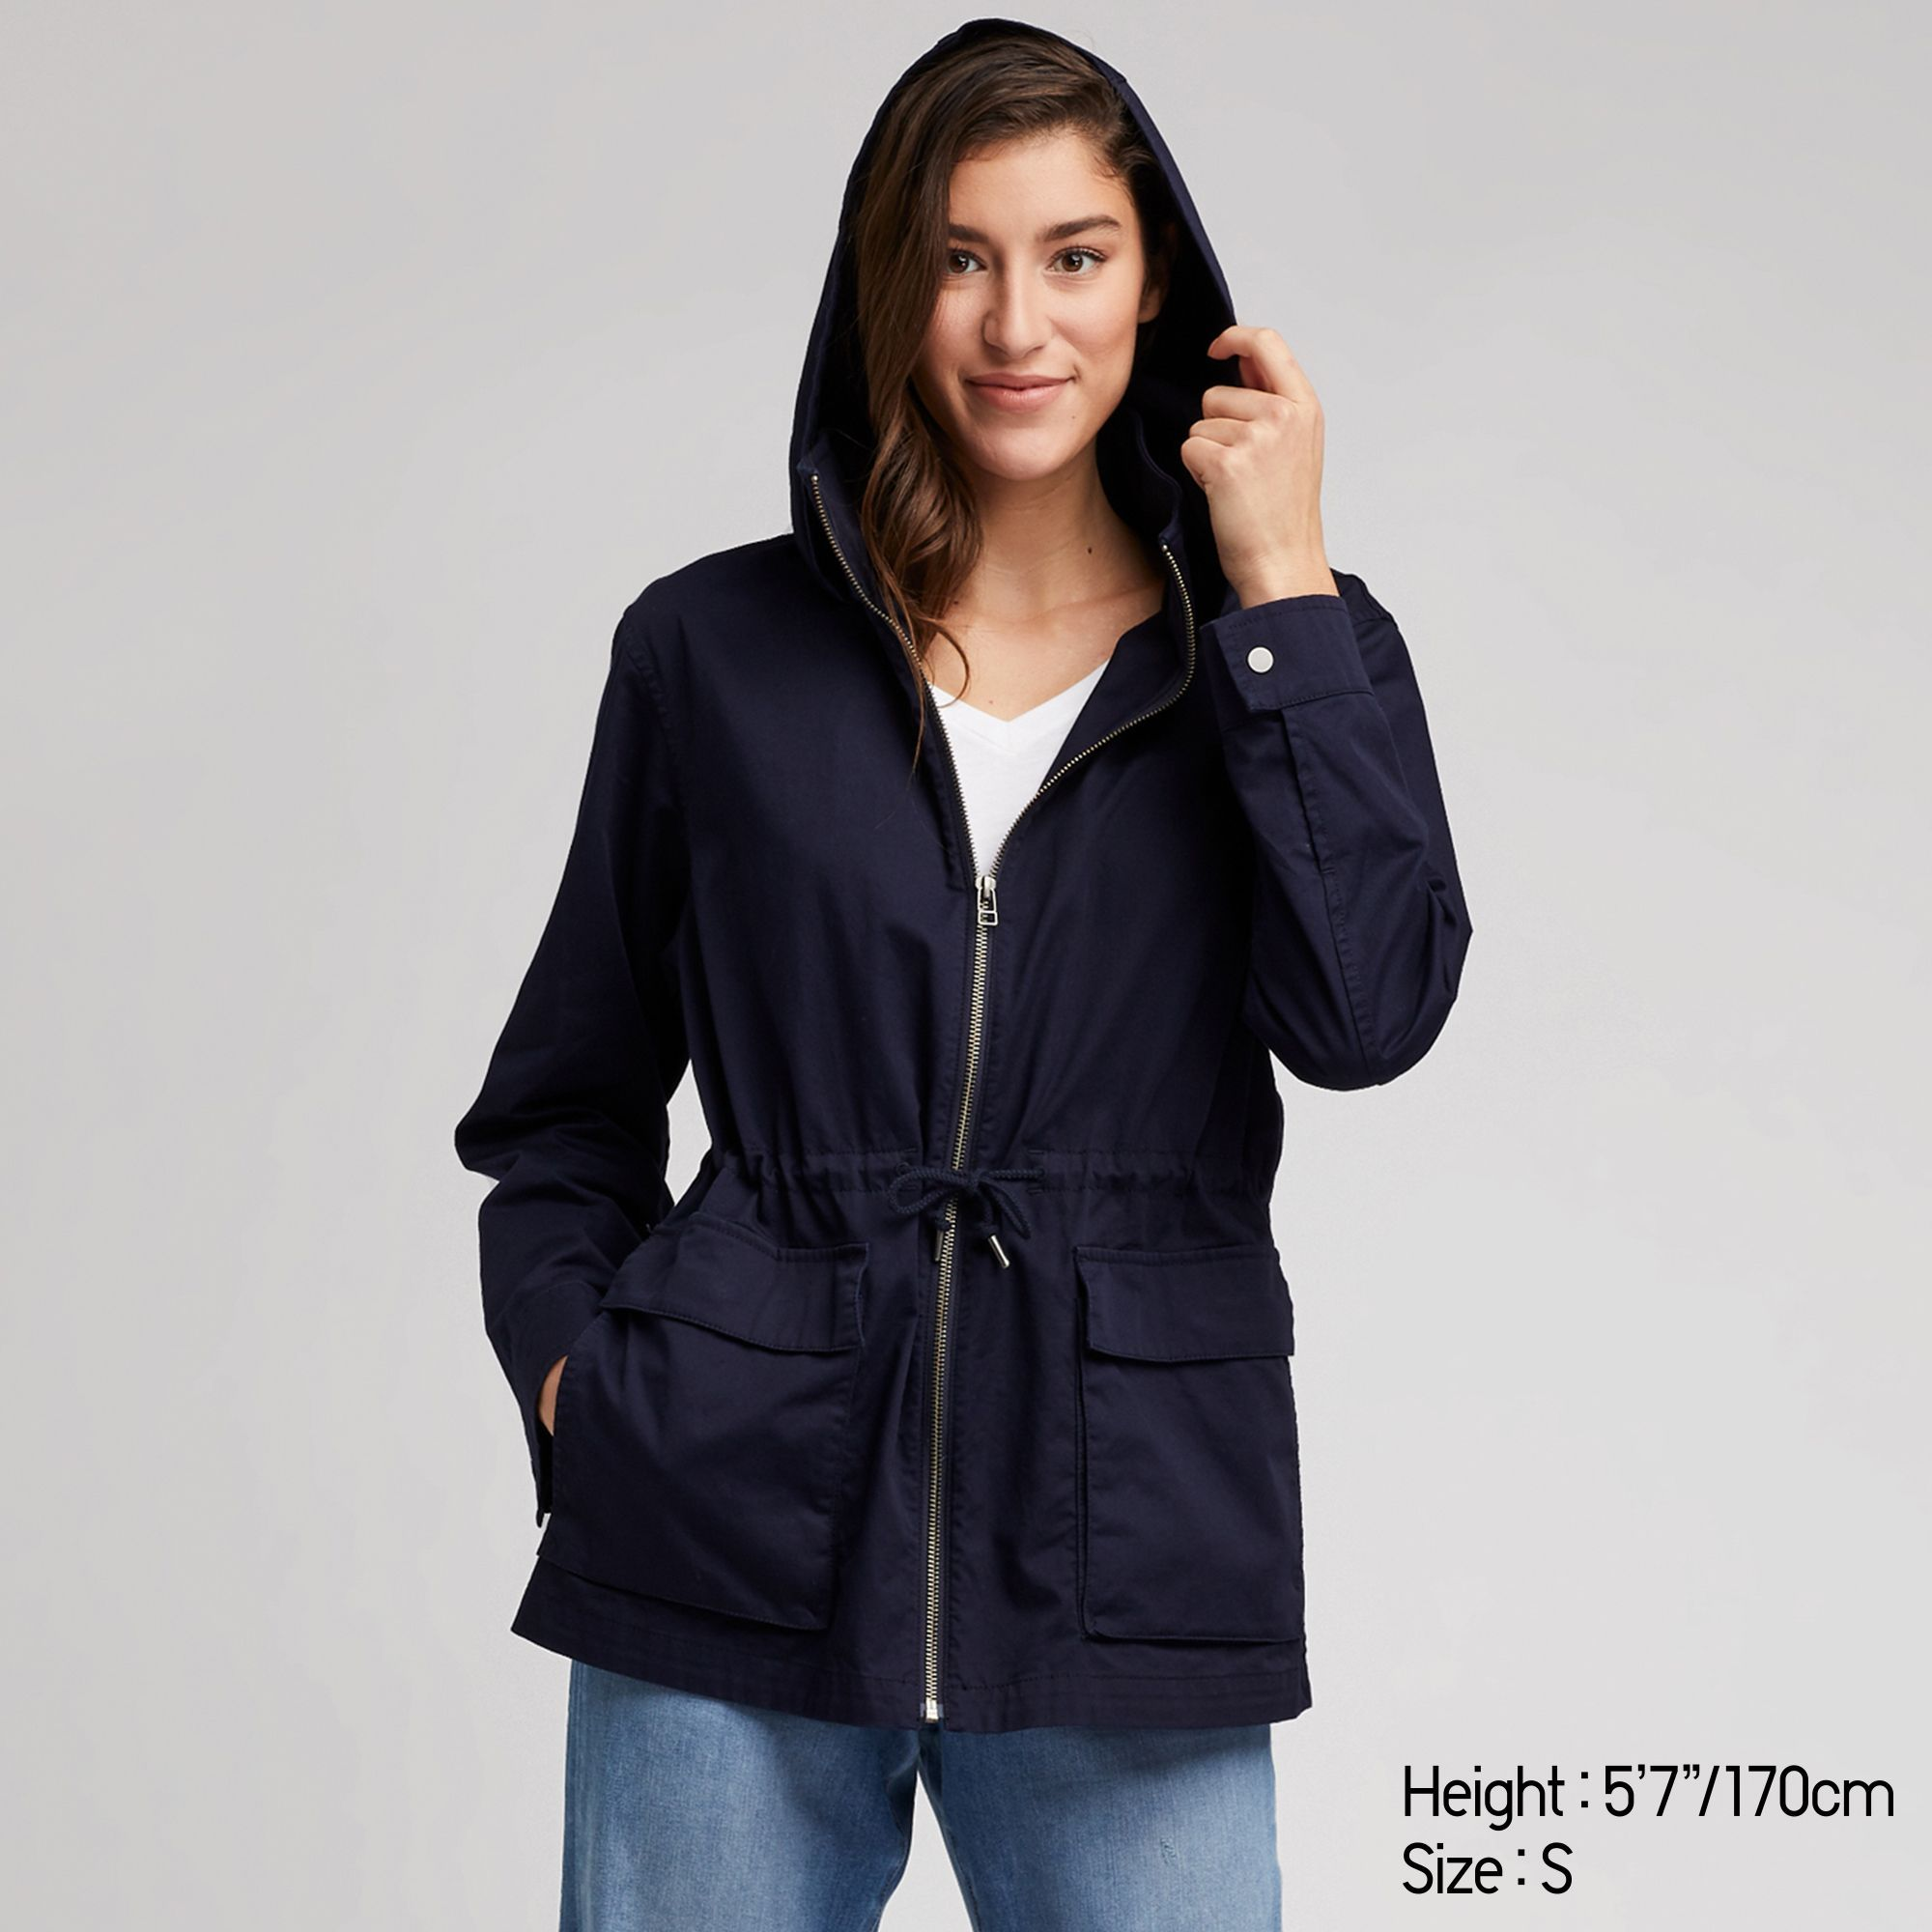 Cotton Parka Women Outerwear Jacket Denim Jacket Women Outerwear Women [ 2000 x 2000 Pixel ]